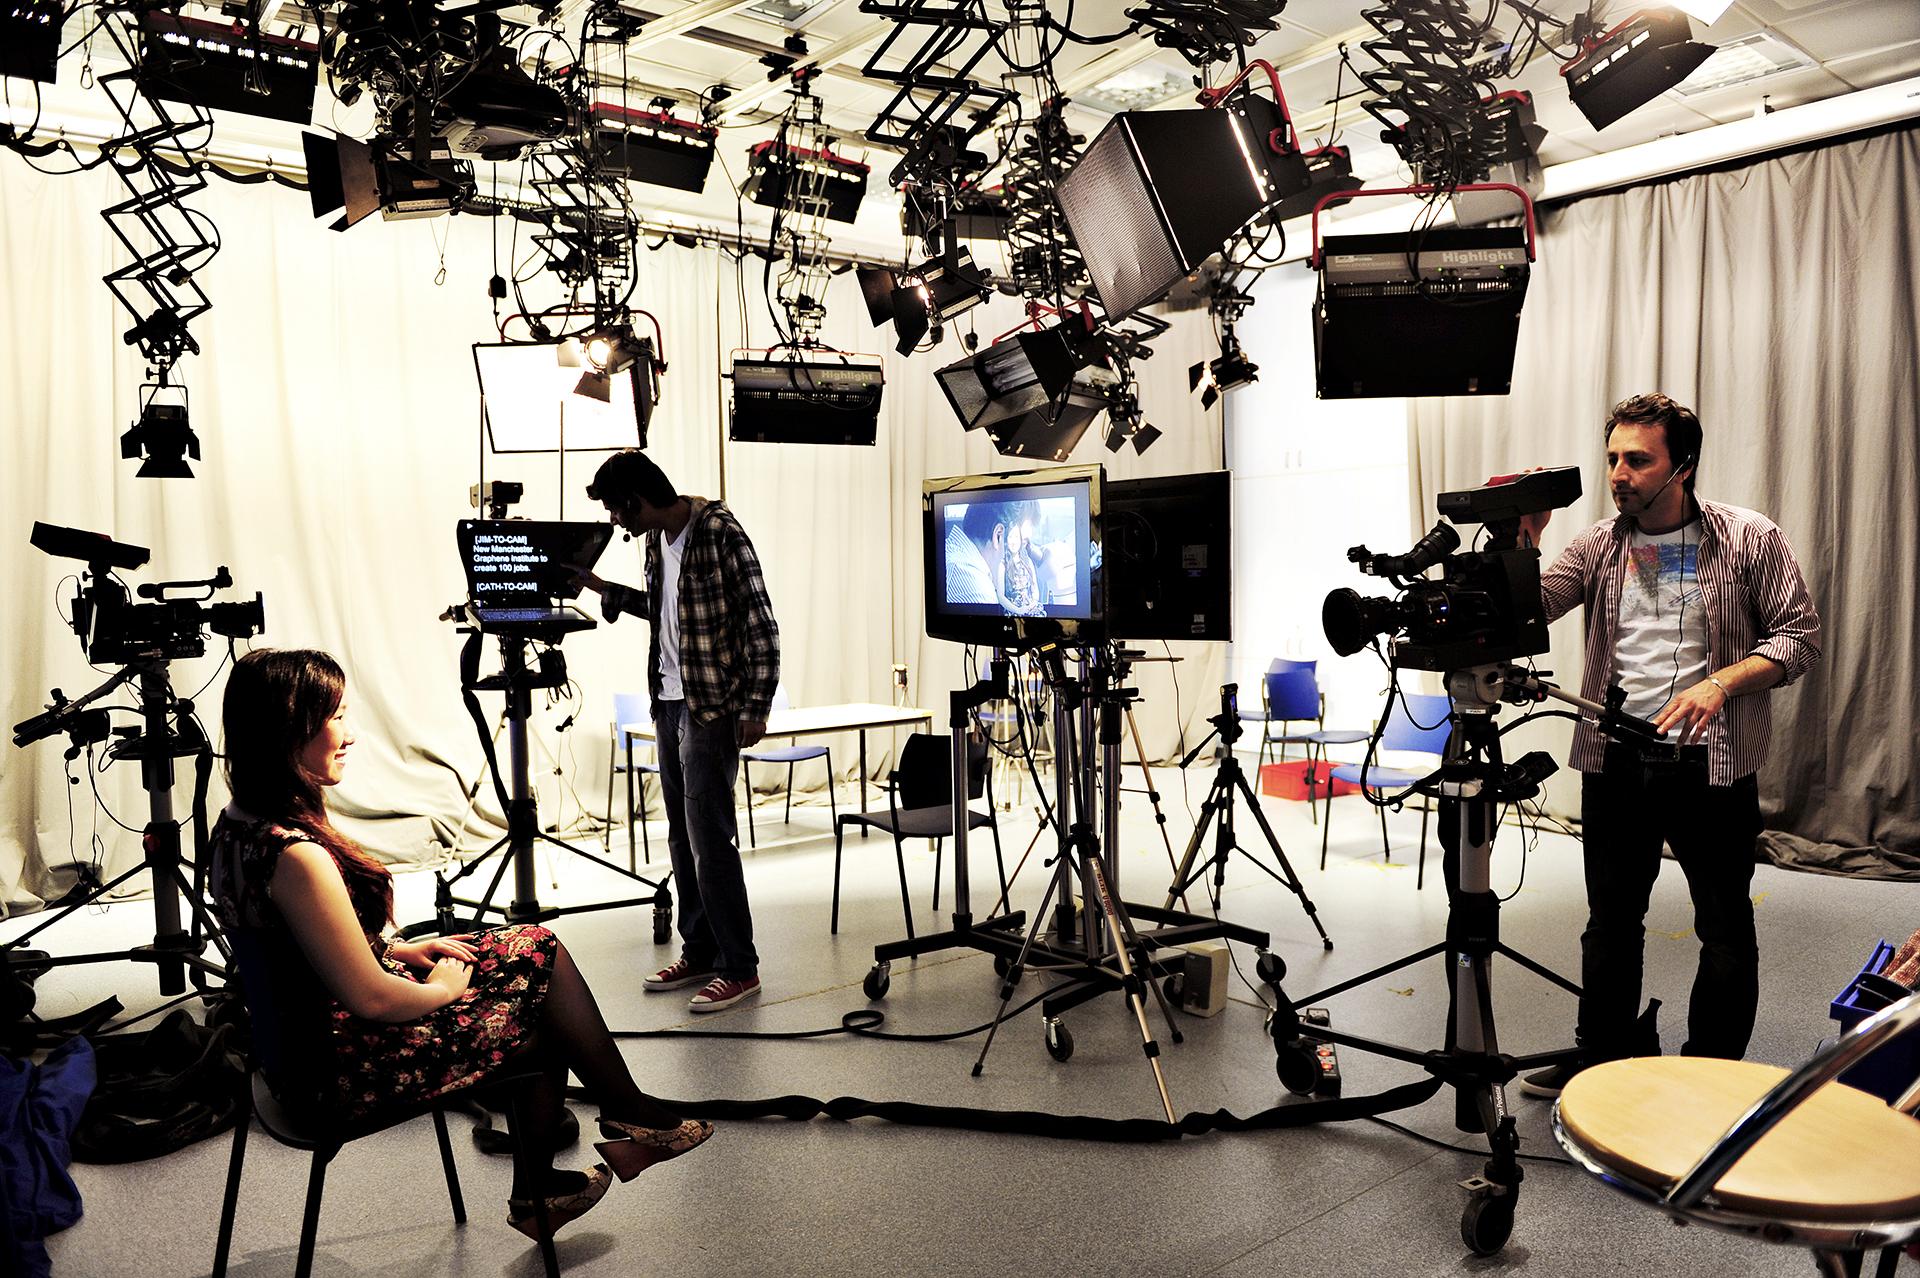 Students using the multimedia facilities at Manchester Metropolitan University